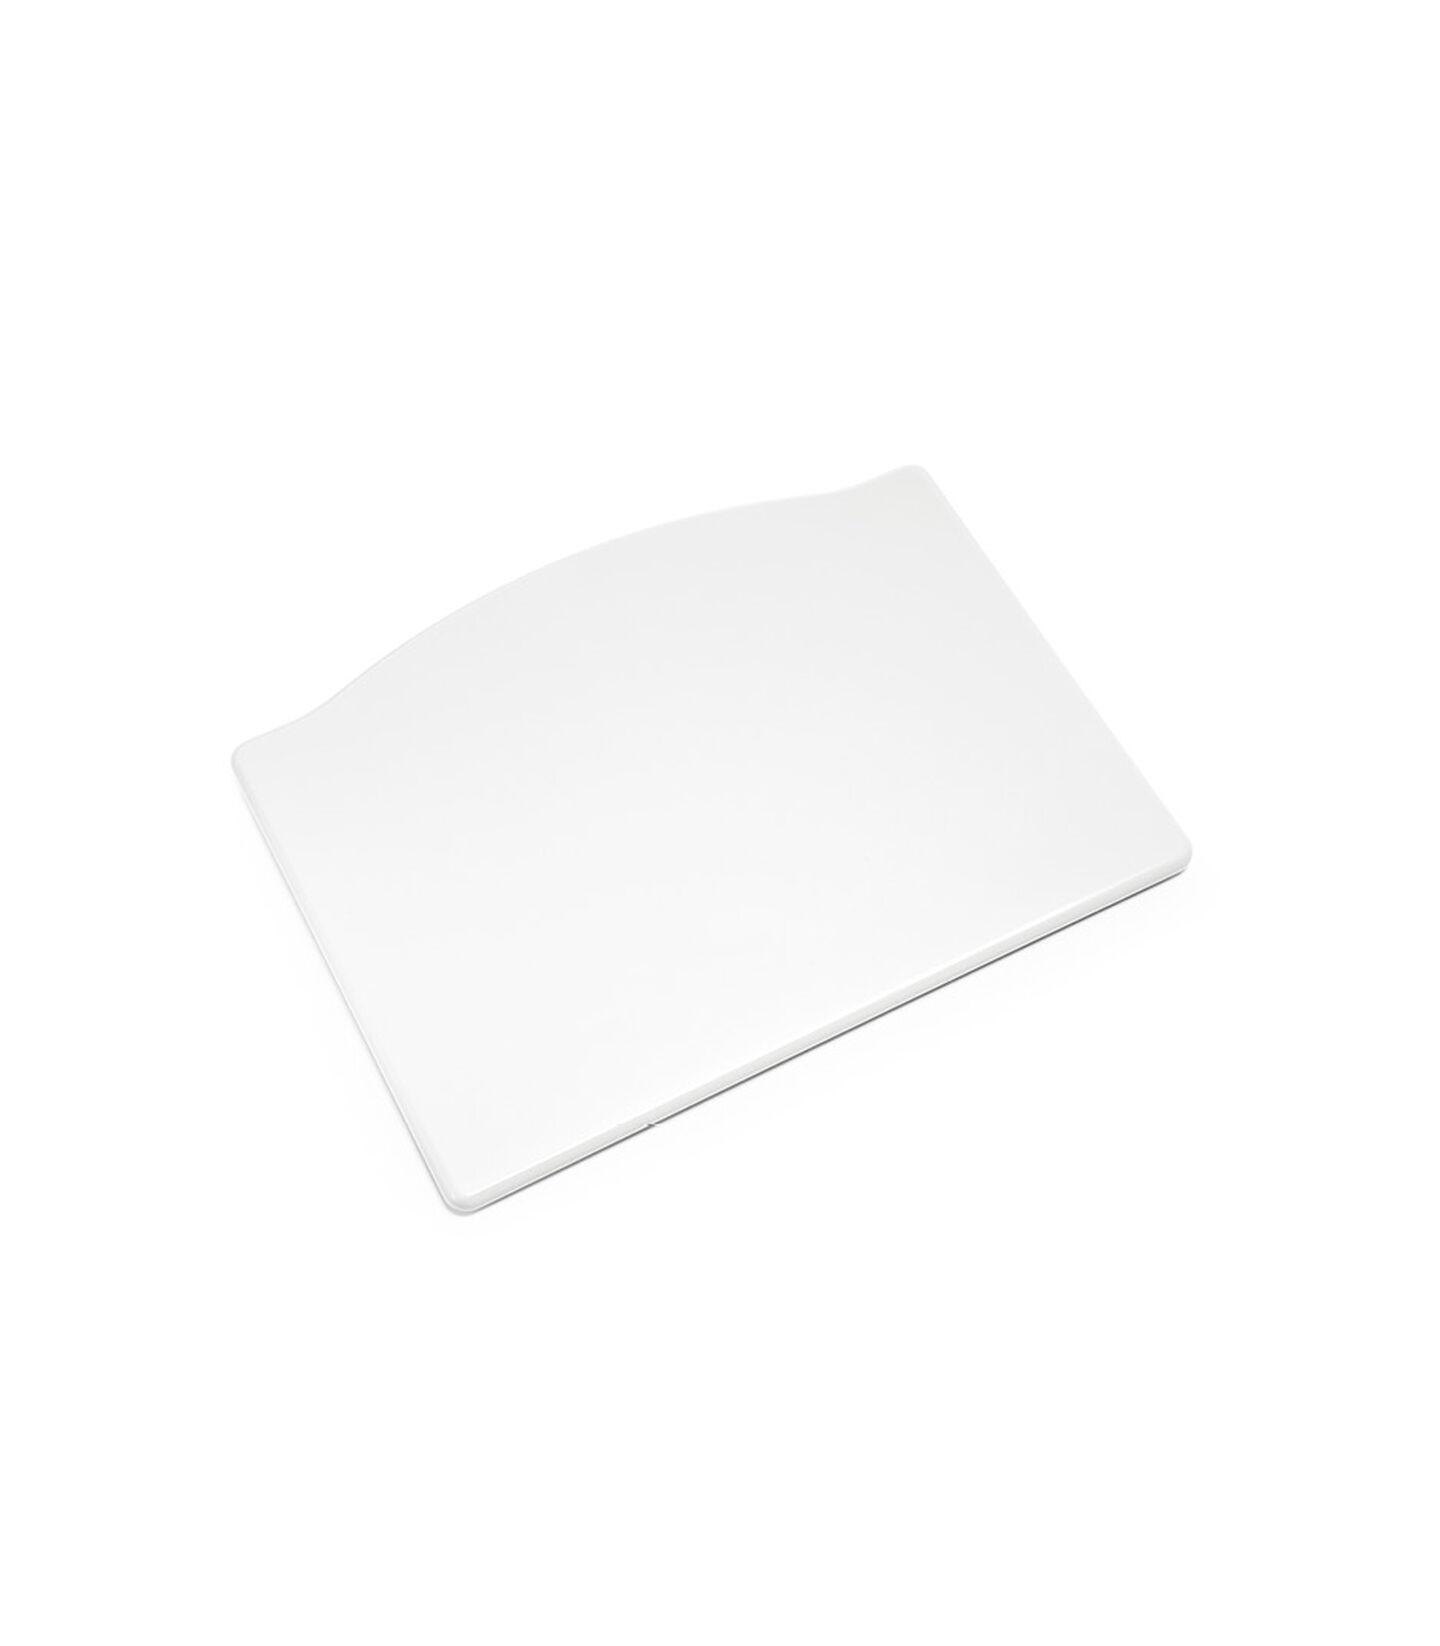 Tripp Trapp® Footplate White, White, mainview view 2